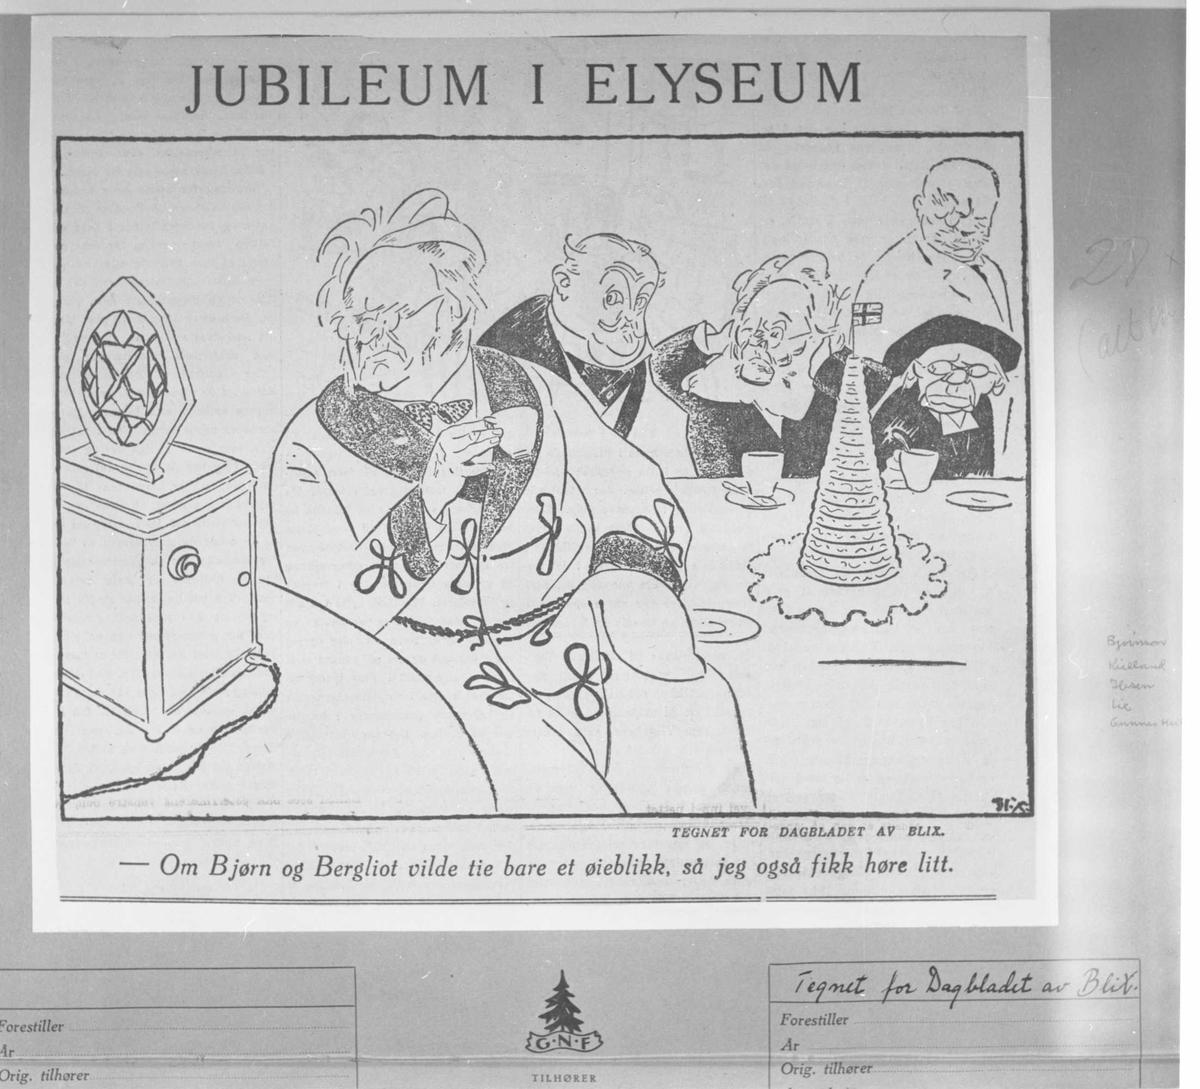 Karikatur, Jubileum i Elyseum, Blix, Ibsen, Kielland, Lie,